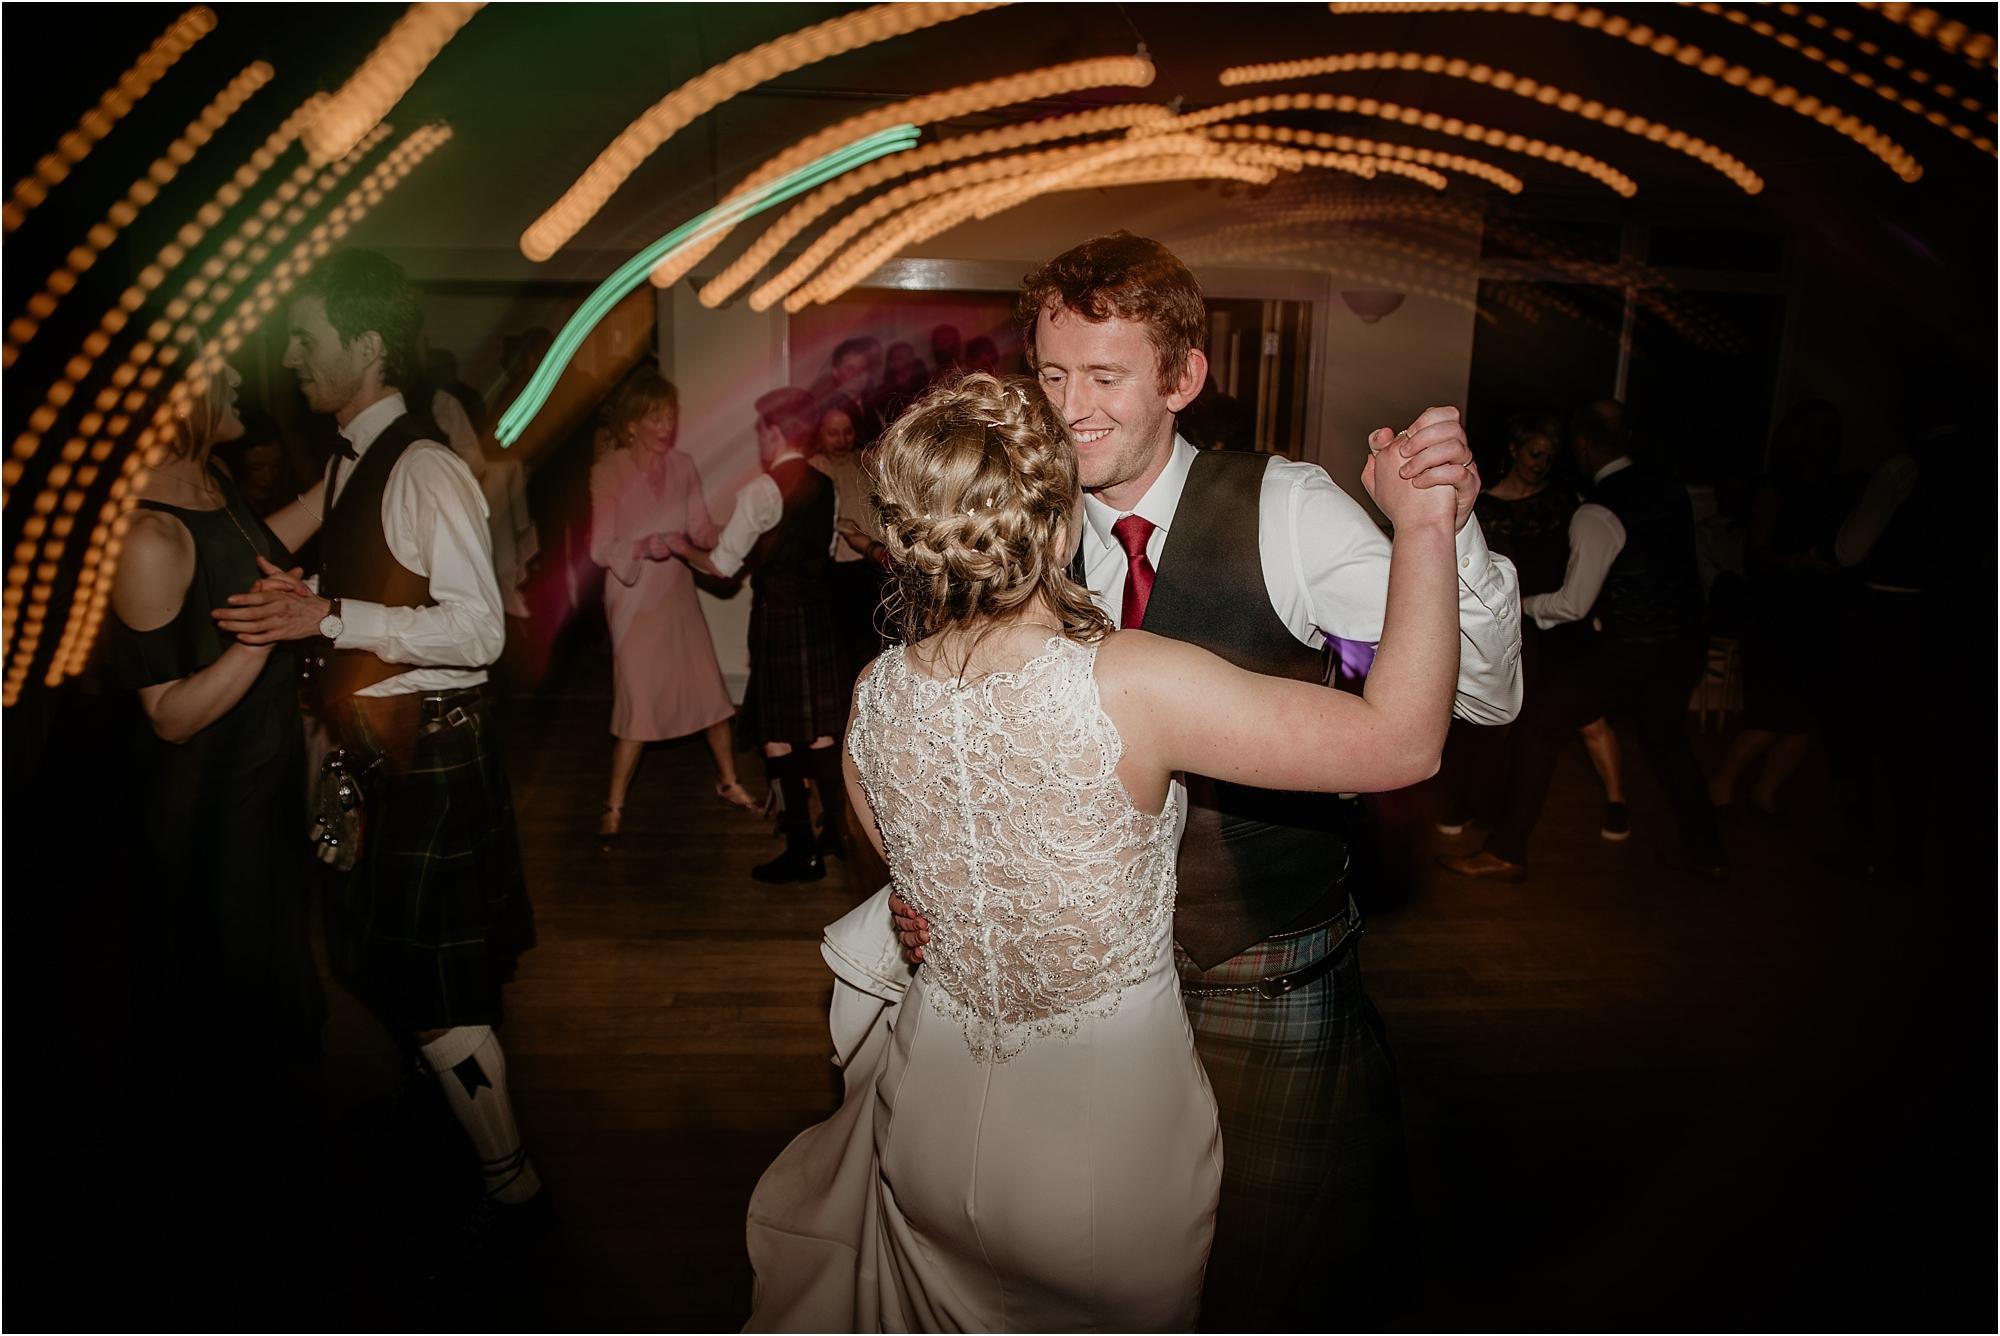 Kinlochard-village-hall-scottish-wedding-claire-fleck-photography__0124.jpg